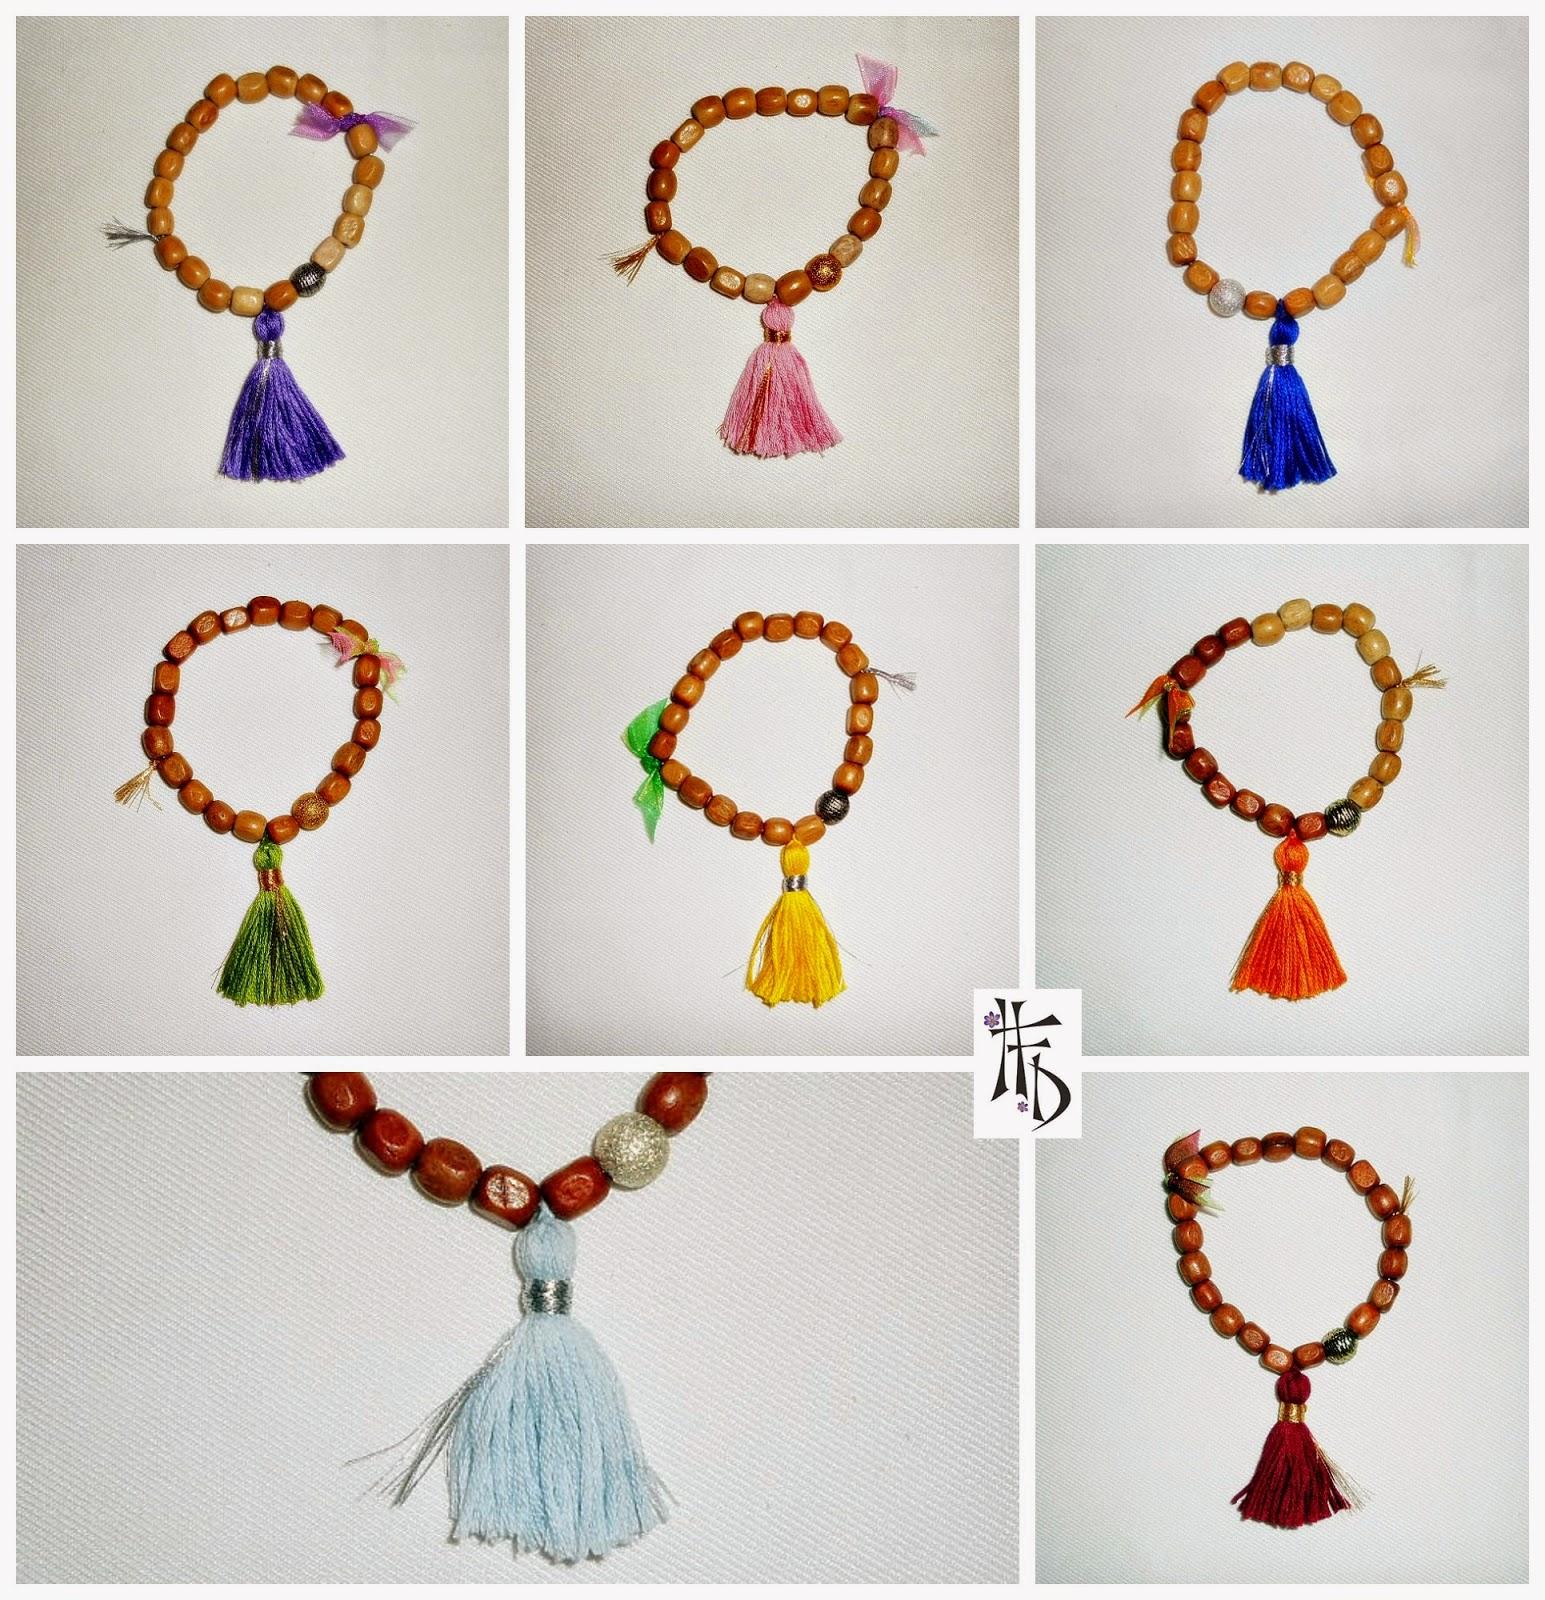 MALA TASSEL. Pulseras con cuentas de madera y borlas / Bracelets with wooden beads and tassels